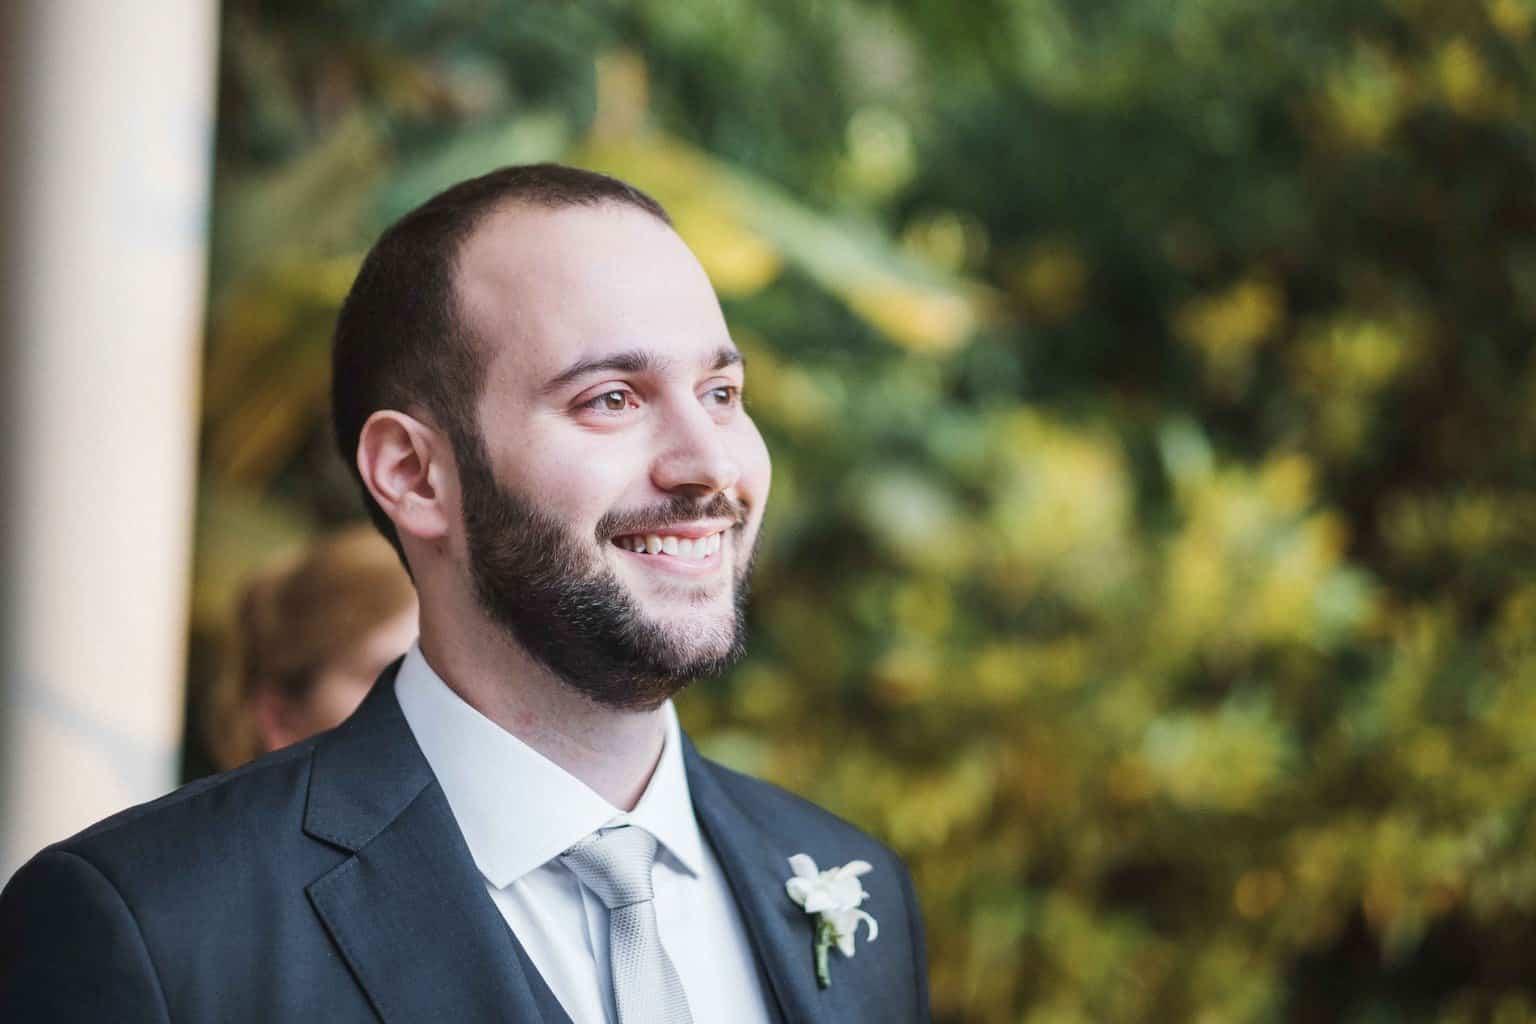 casamento-na-serra-cerimonia-ao-ar-livre-Fotografia-Renata-Xavier-Les-Amies-Cerimonial-Locanda-Della-Mimosa-Natalia-e-Bruno-noivo341